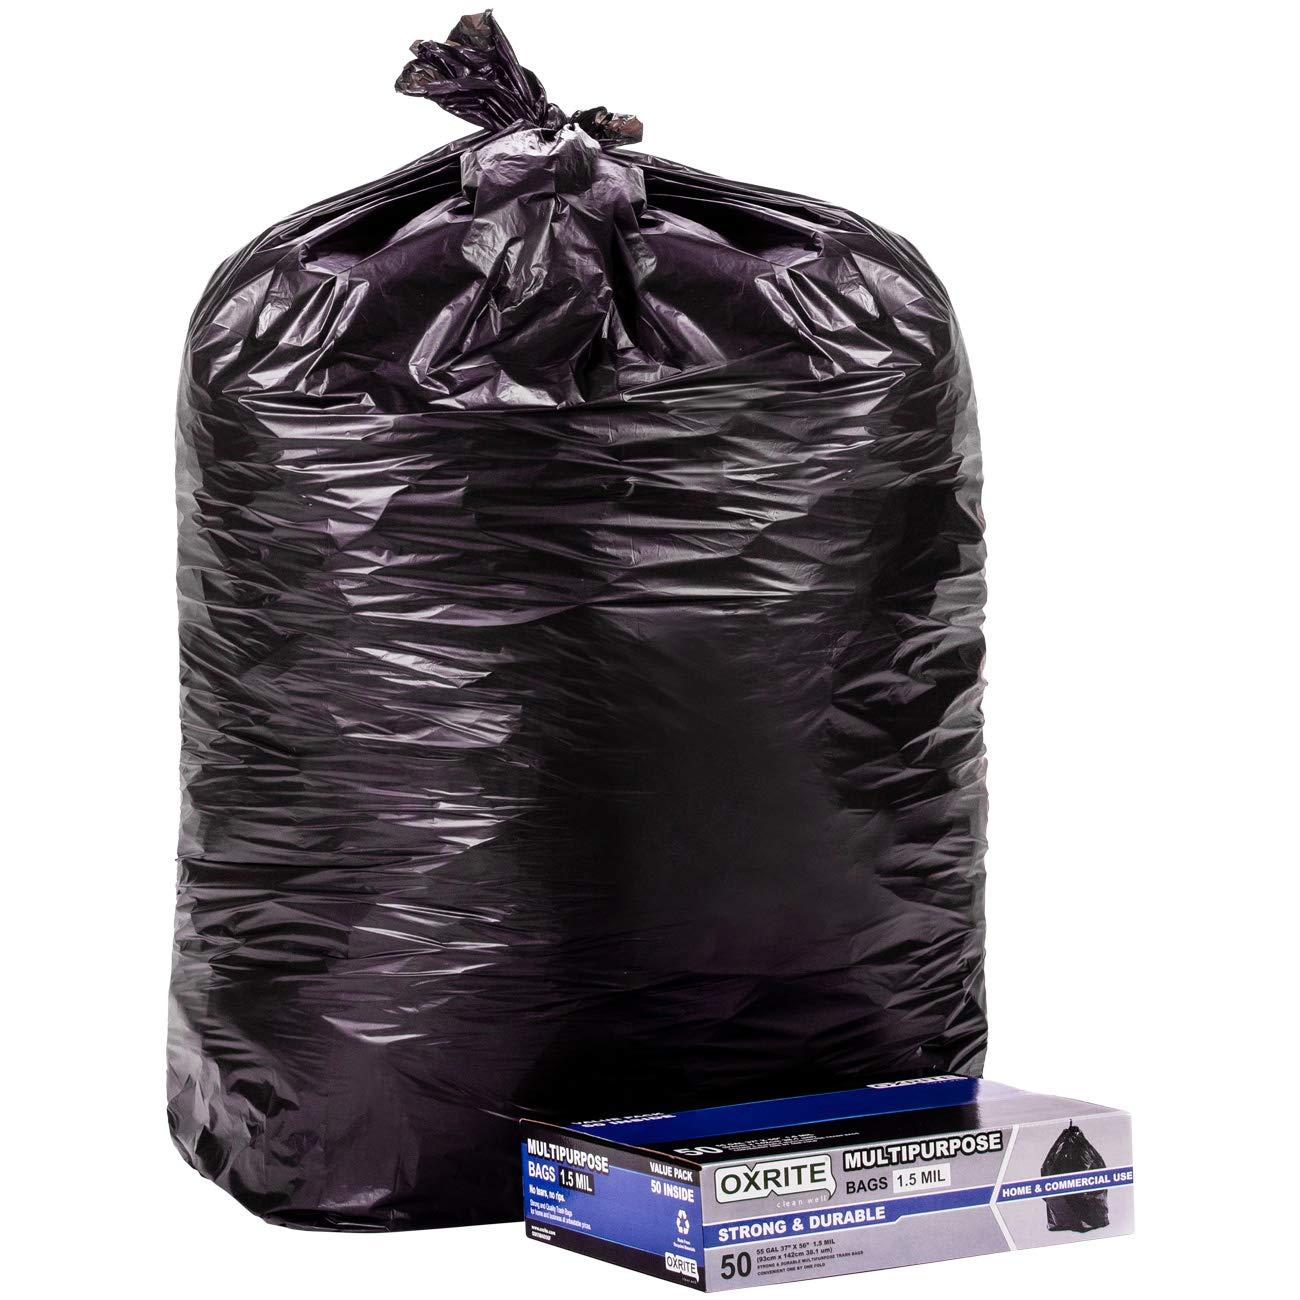 OXRITE 55ガロンゴミ袋 | 高耐久ゴミ袋 厚さ1.5ミル 50枚 ブラックゴミ袋 B07N1FV8S3